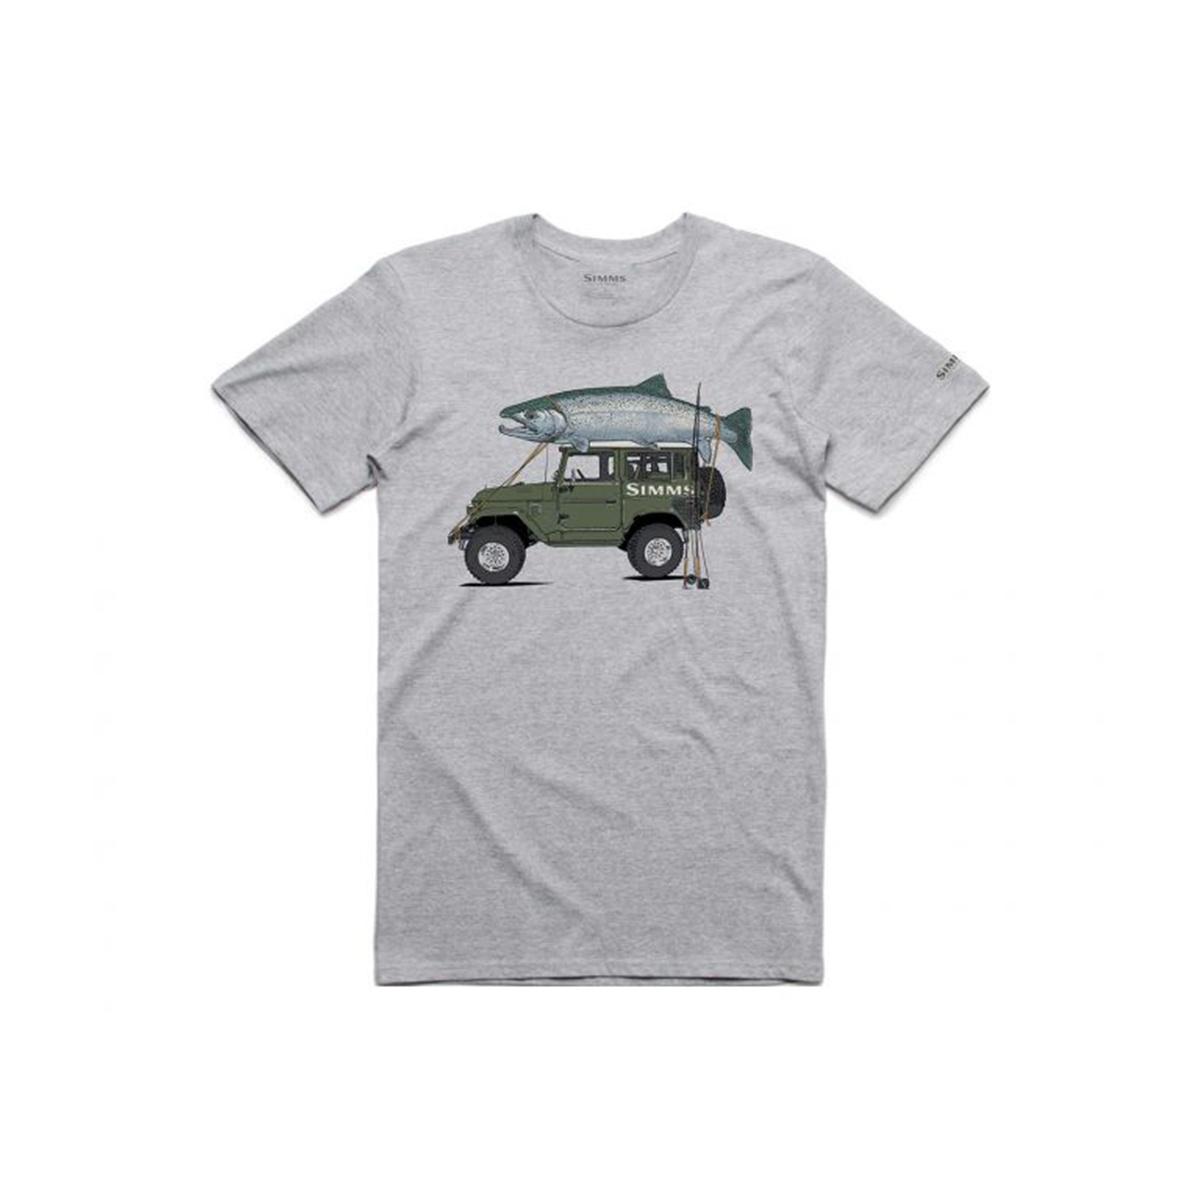 Simms Clothing Men's Trout Cruiser T-Shirt